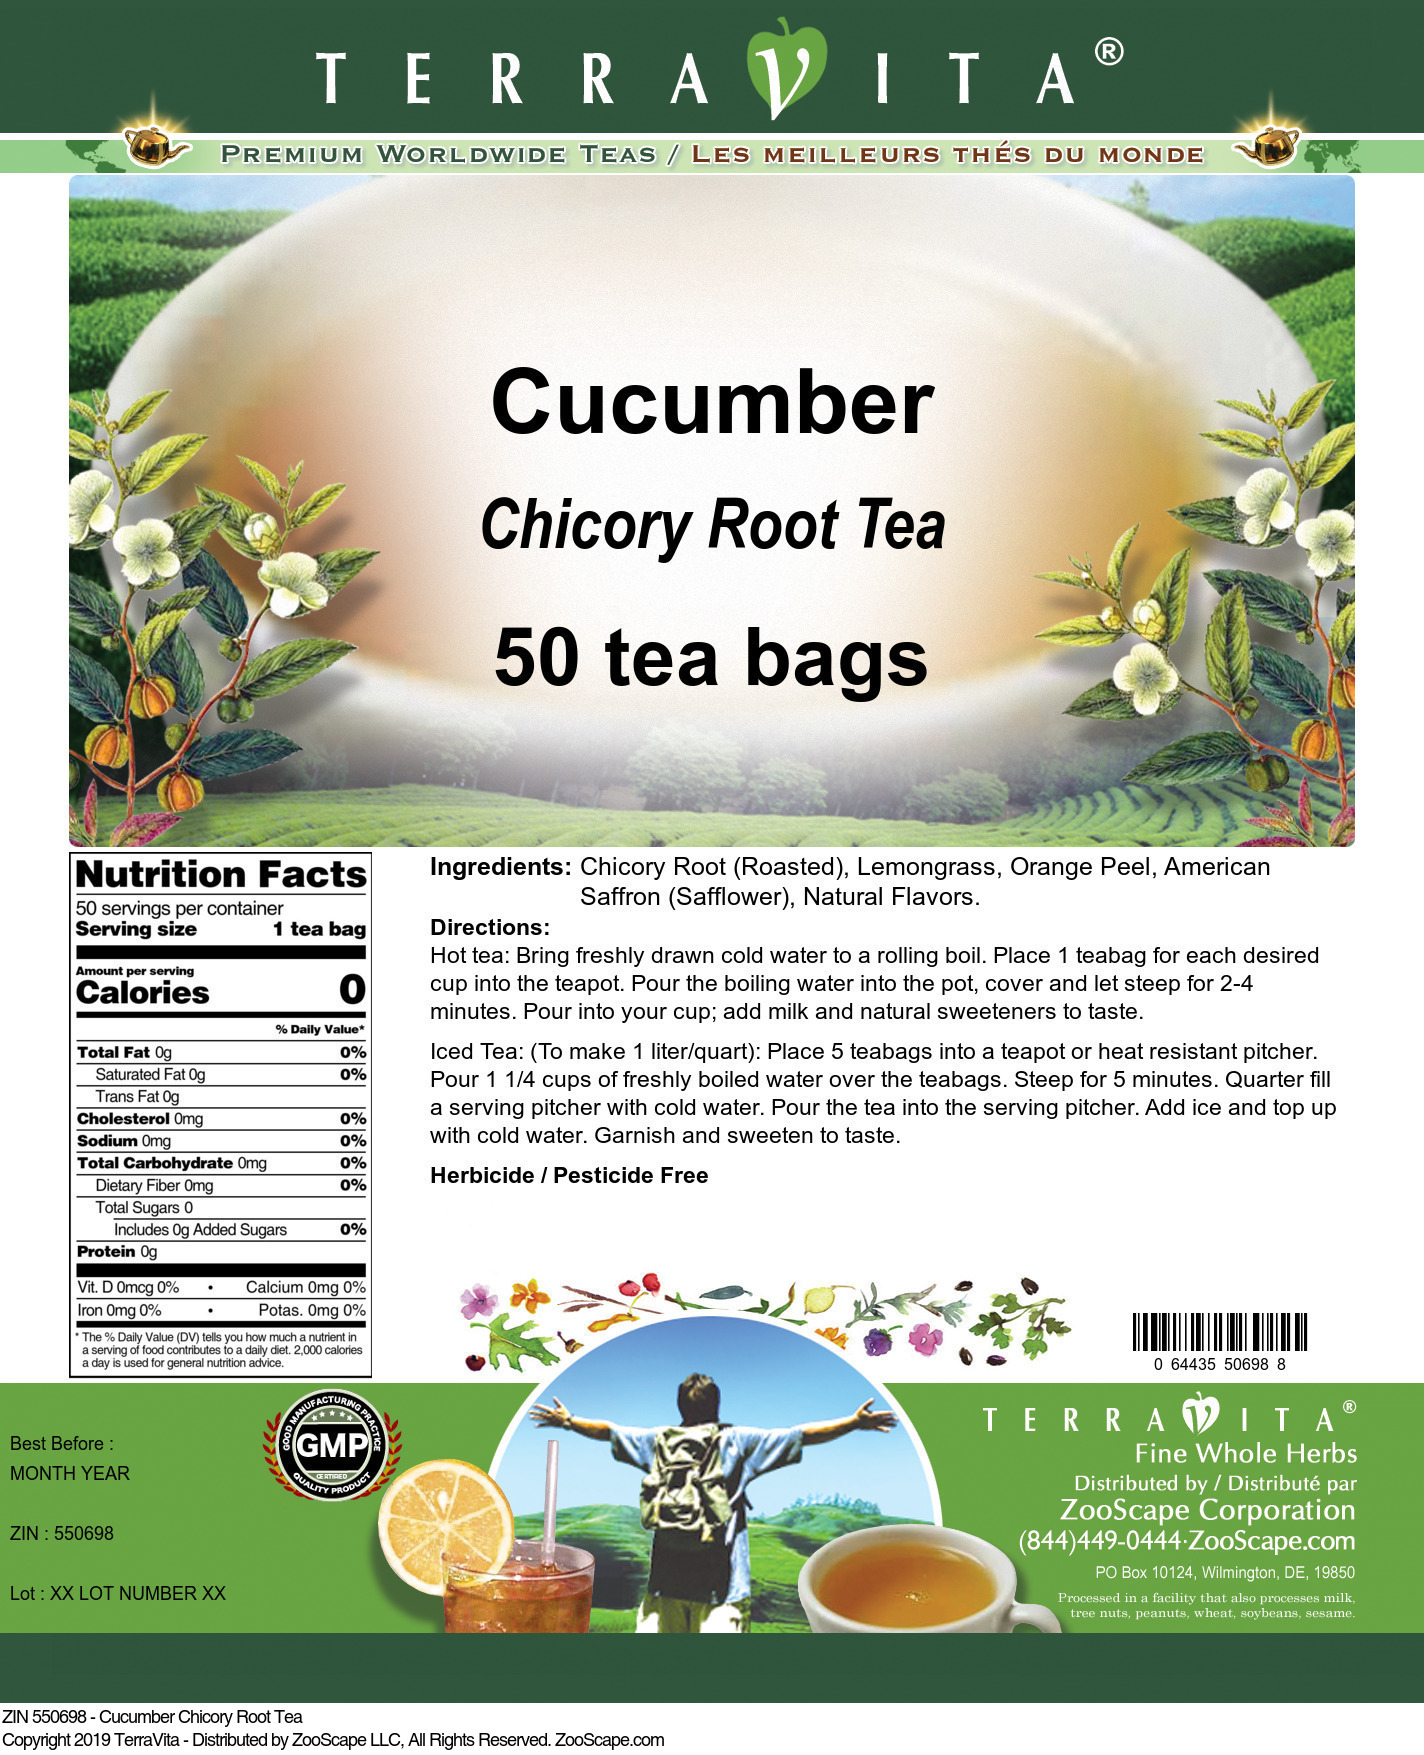 Cucumber Chicory Root